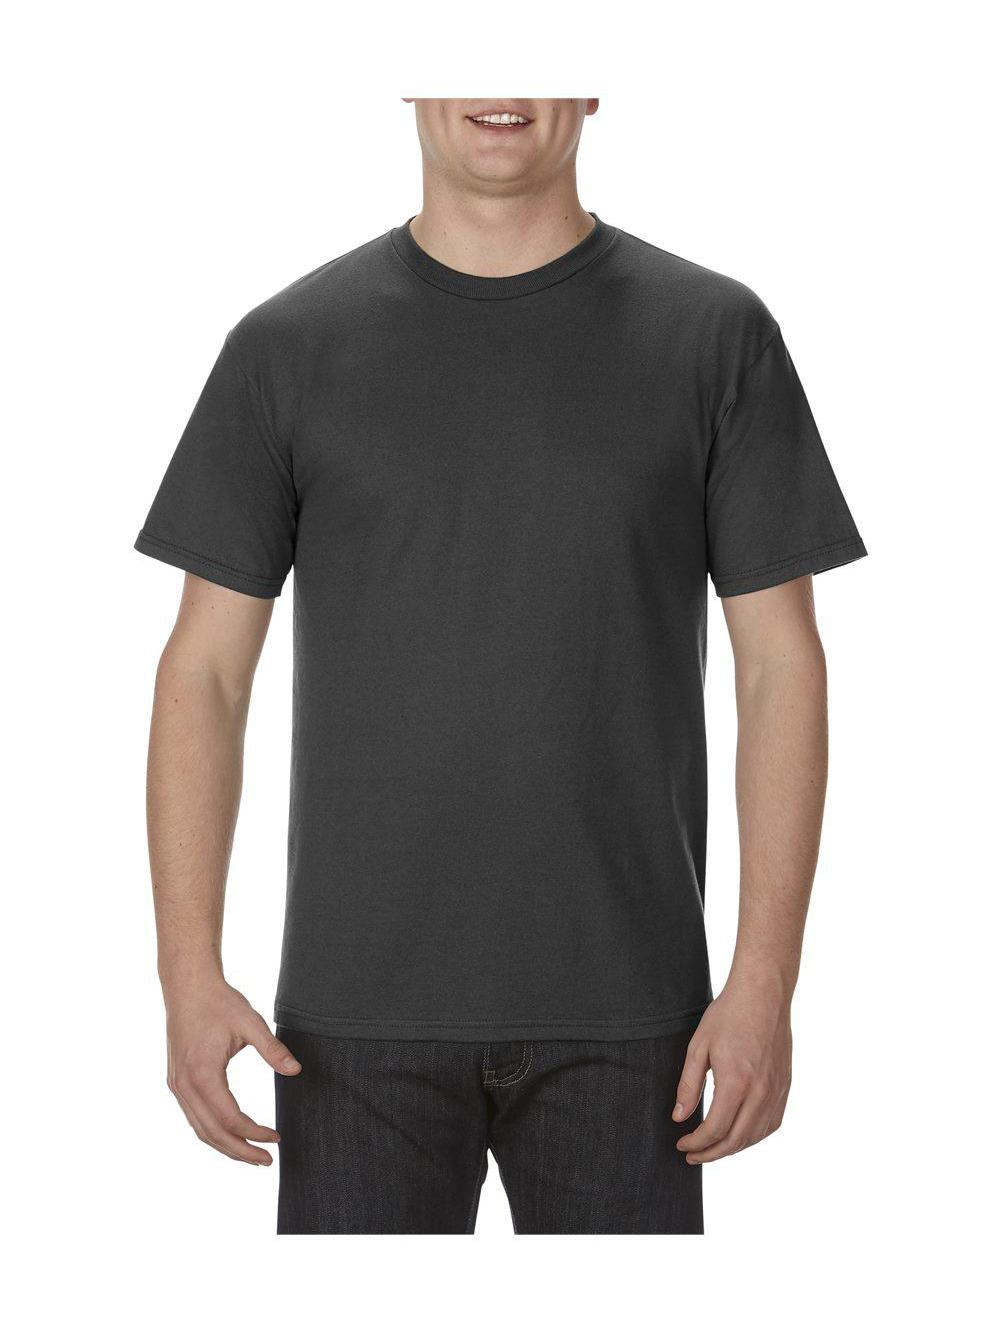 ALSTYLE-Premium-T-Shirt-1701 thumbnail 64